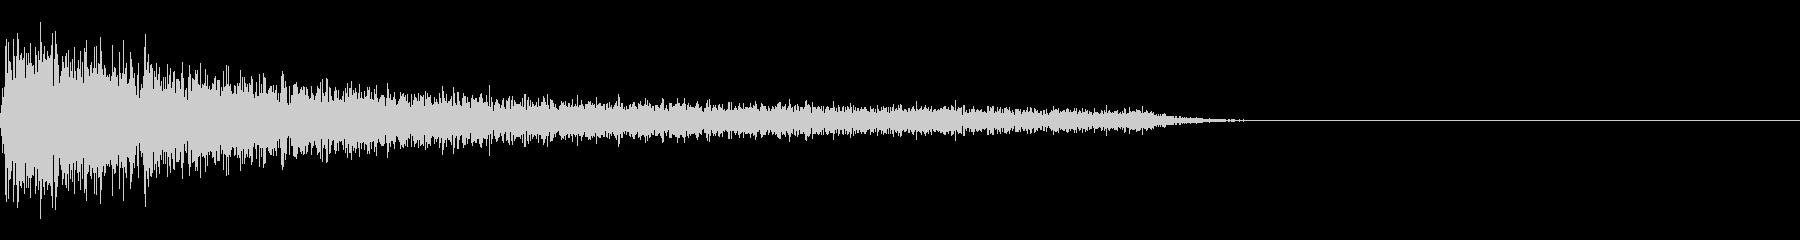 FX・SEピアノ/ショック/衝撃/1-Bの未再生の波形